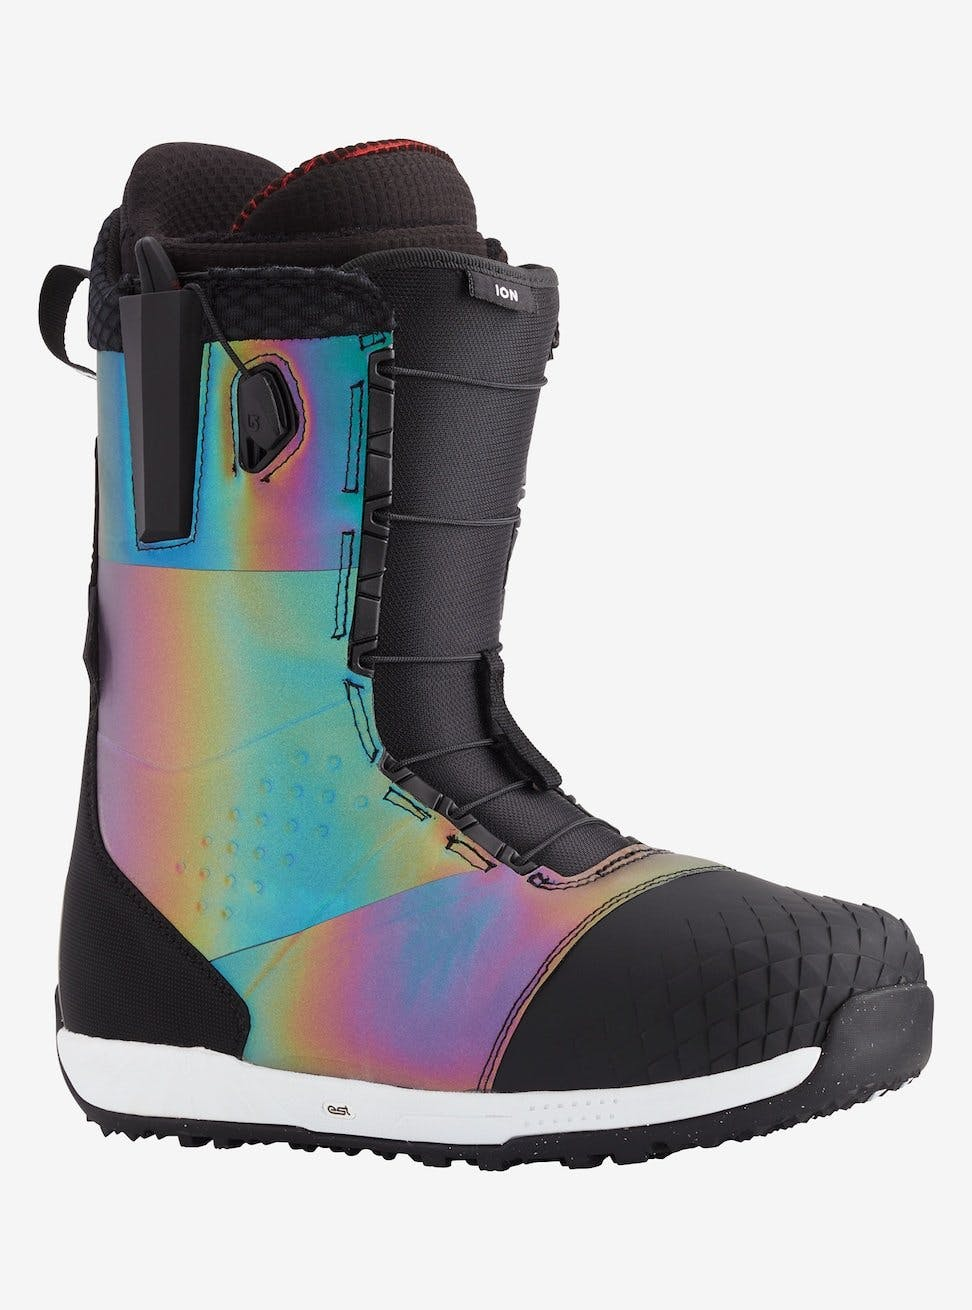 Burton Ion Snowboard Boots · 2021